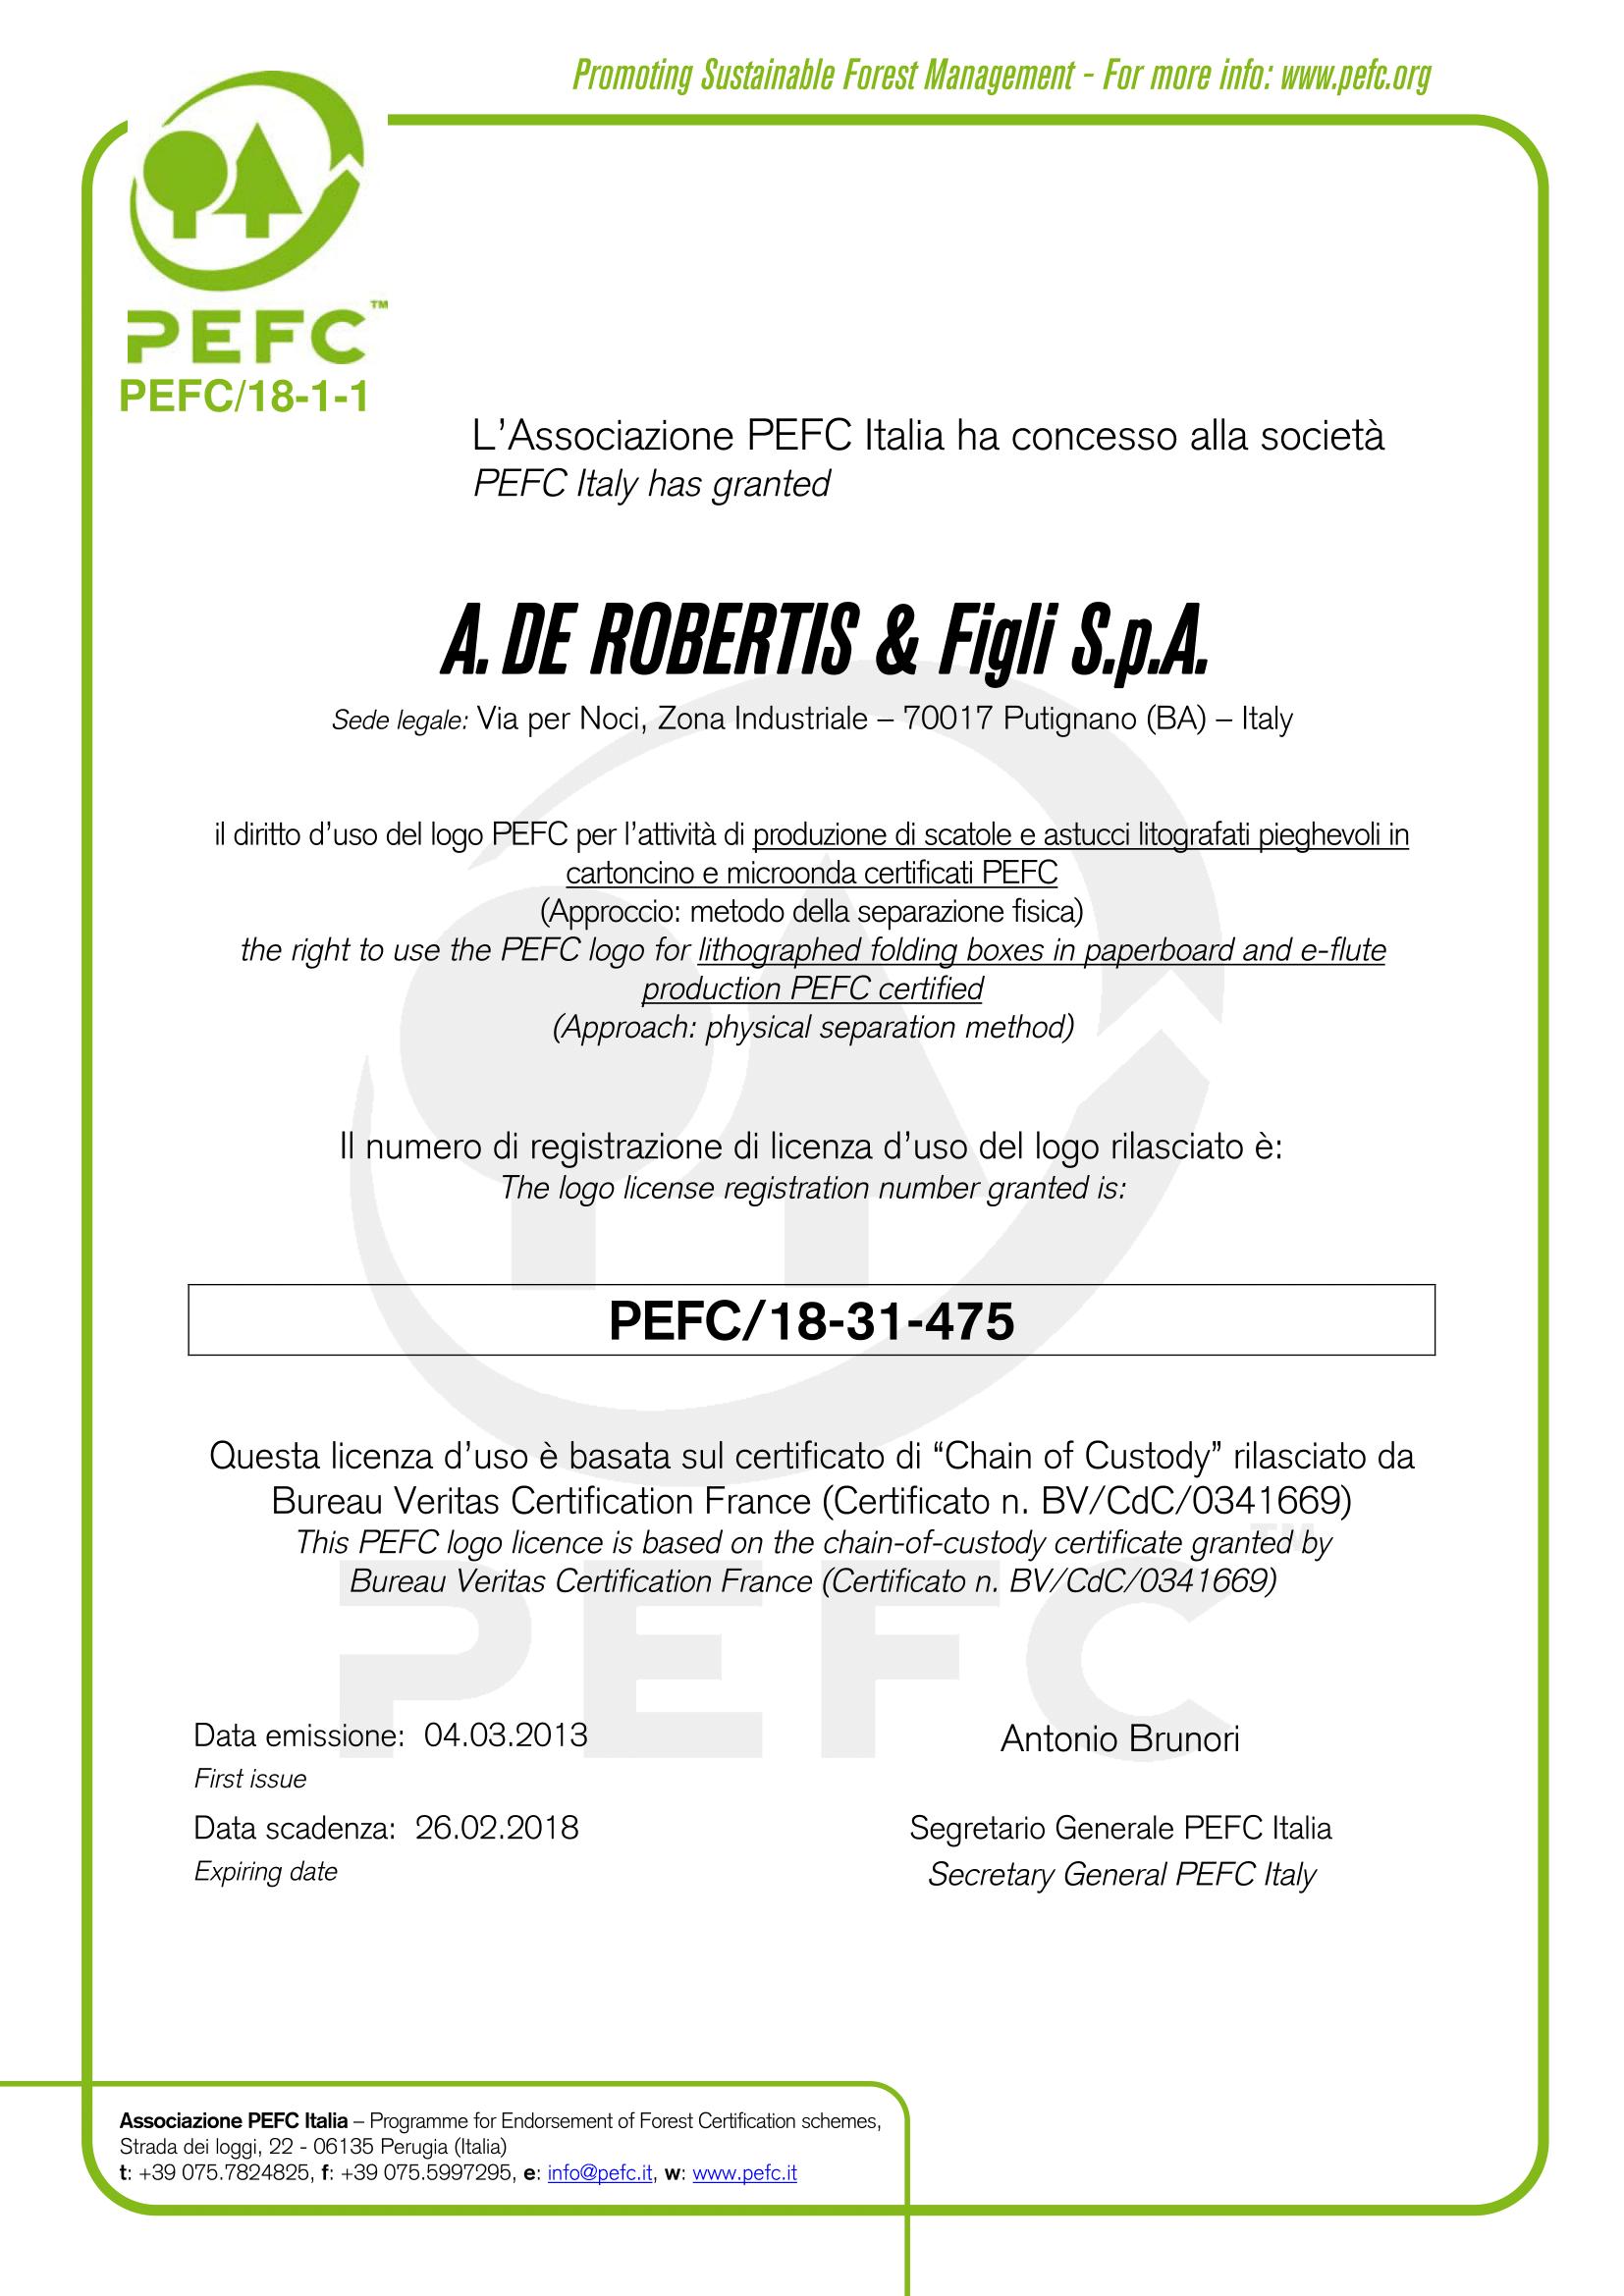 certificato-licenza-a-de-robertis-pefc-2013-1